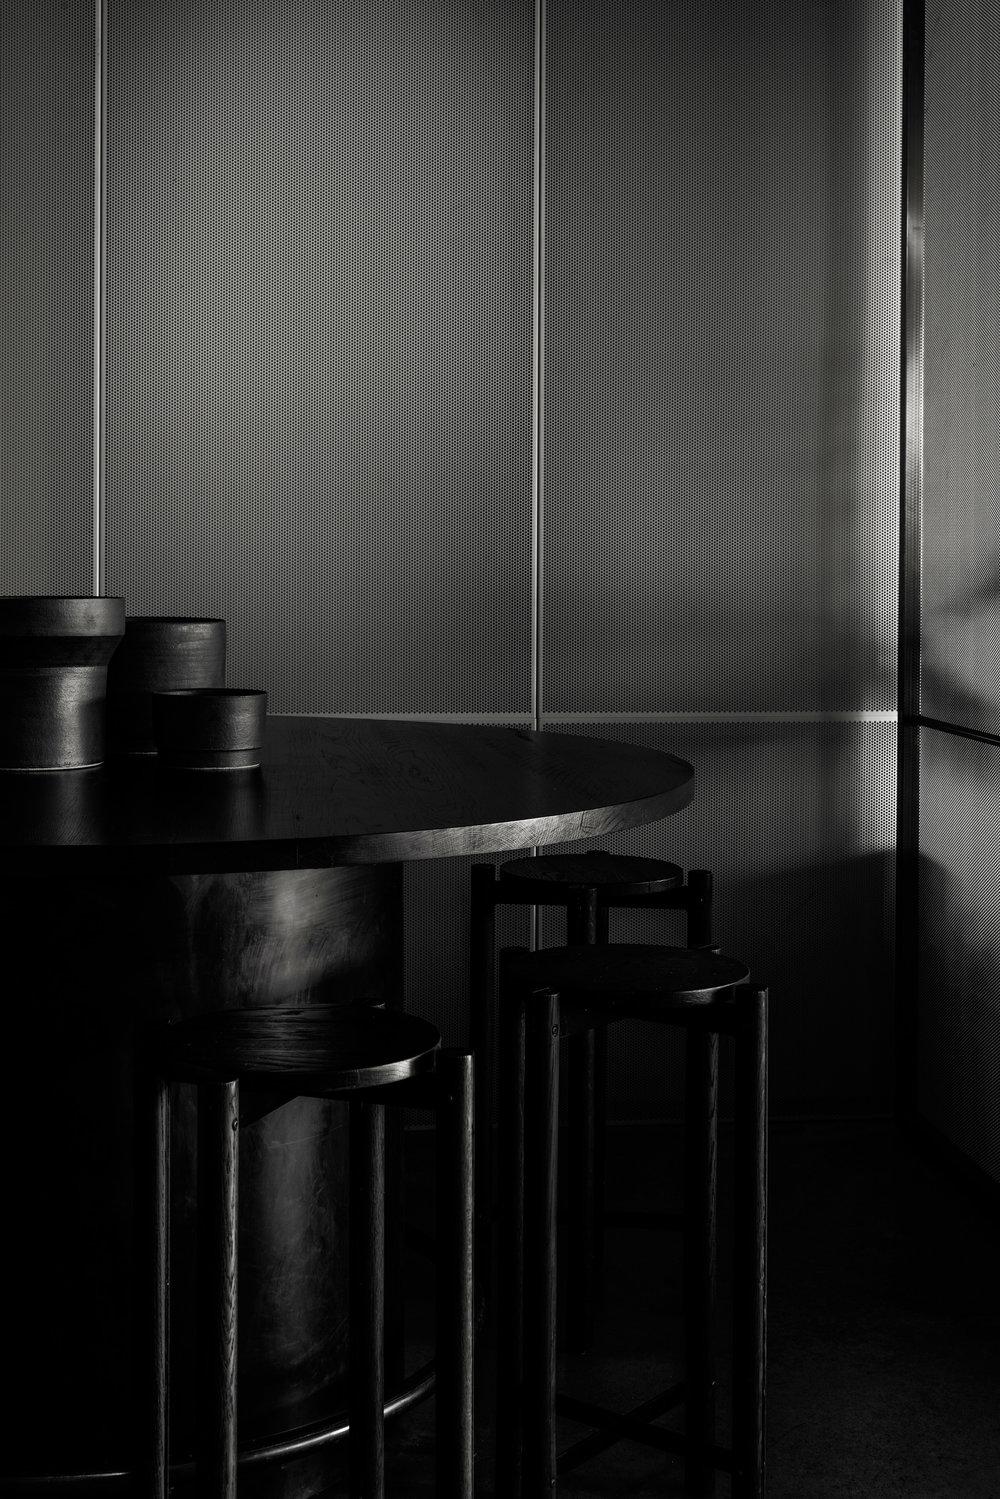 penta-ritz-ghougassian-interior-design-cafe_dezeen_2364_col_14.jpg